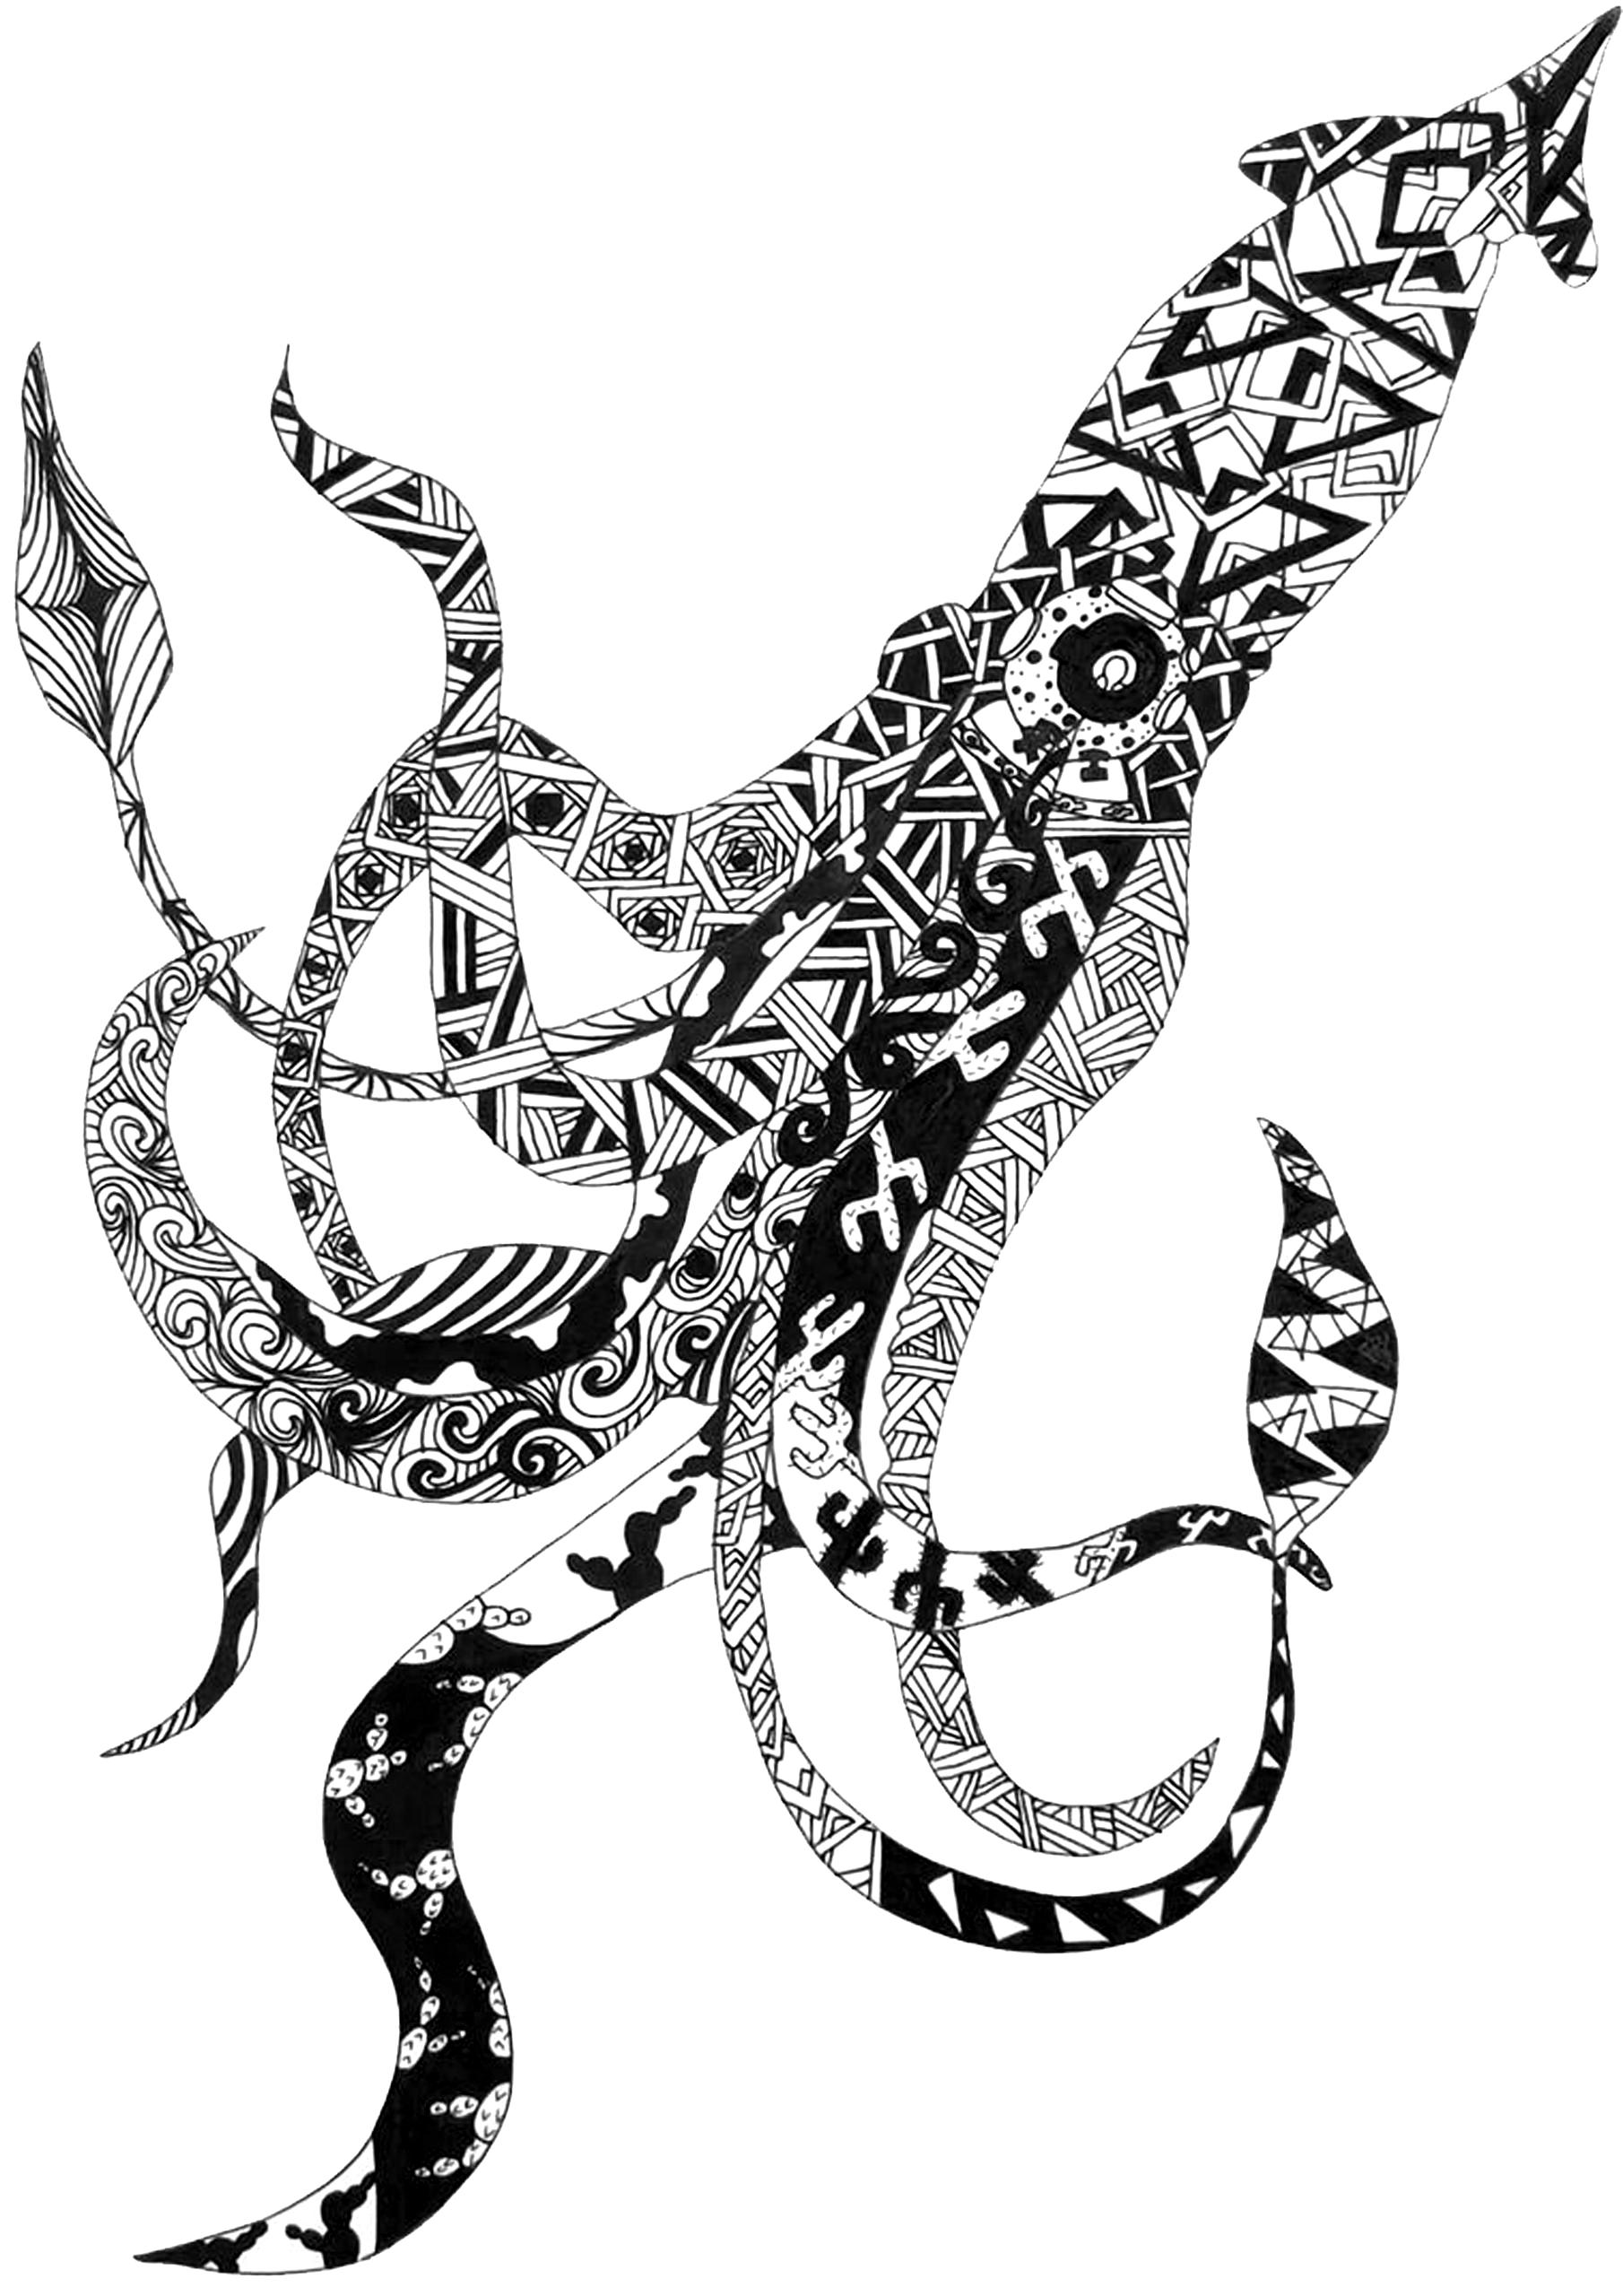 Black and White Dragonfly Artwork